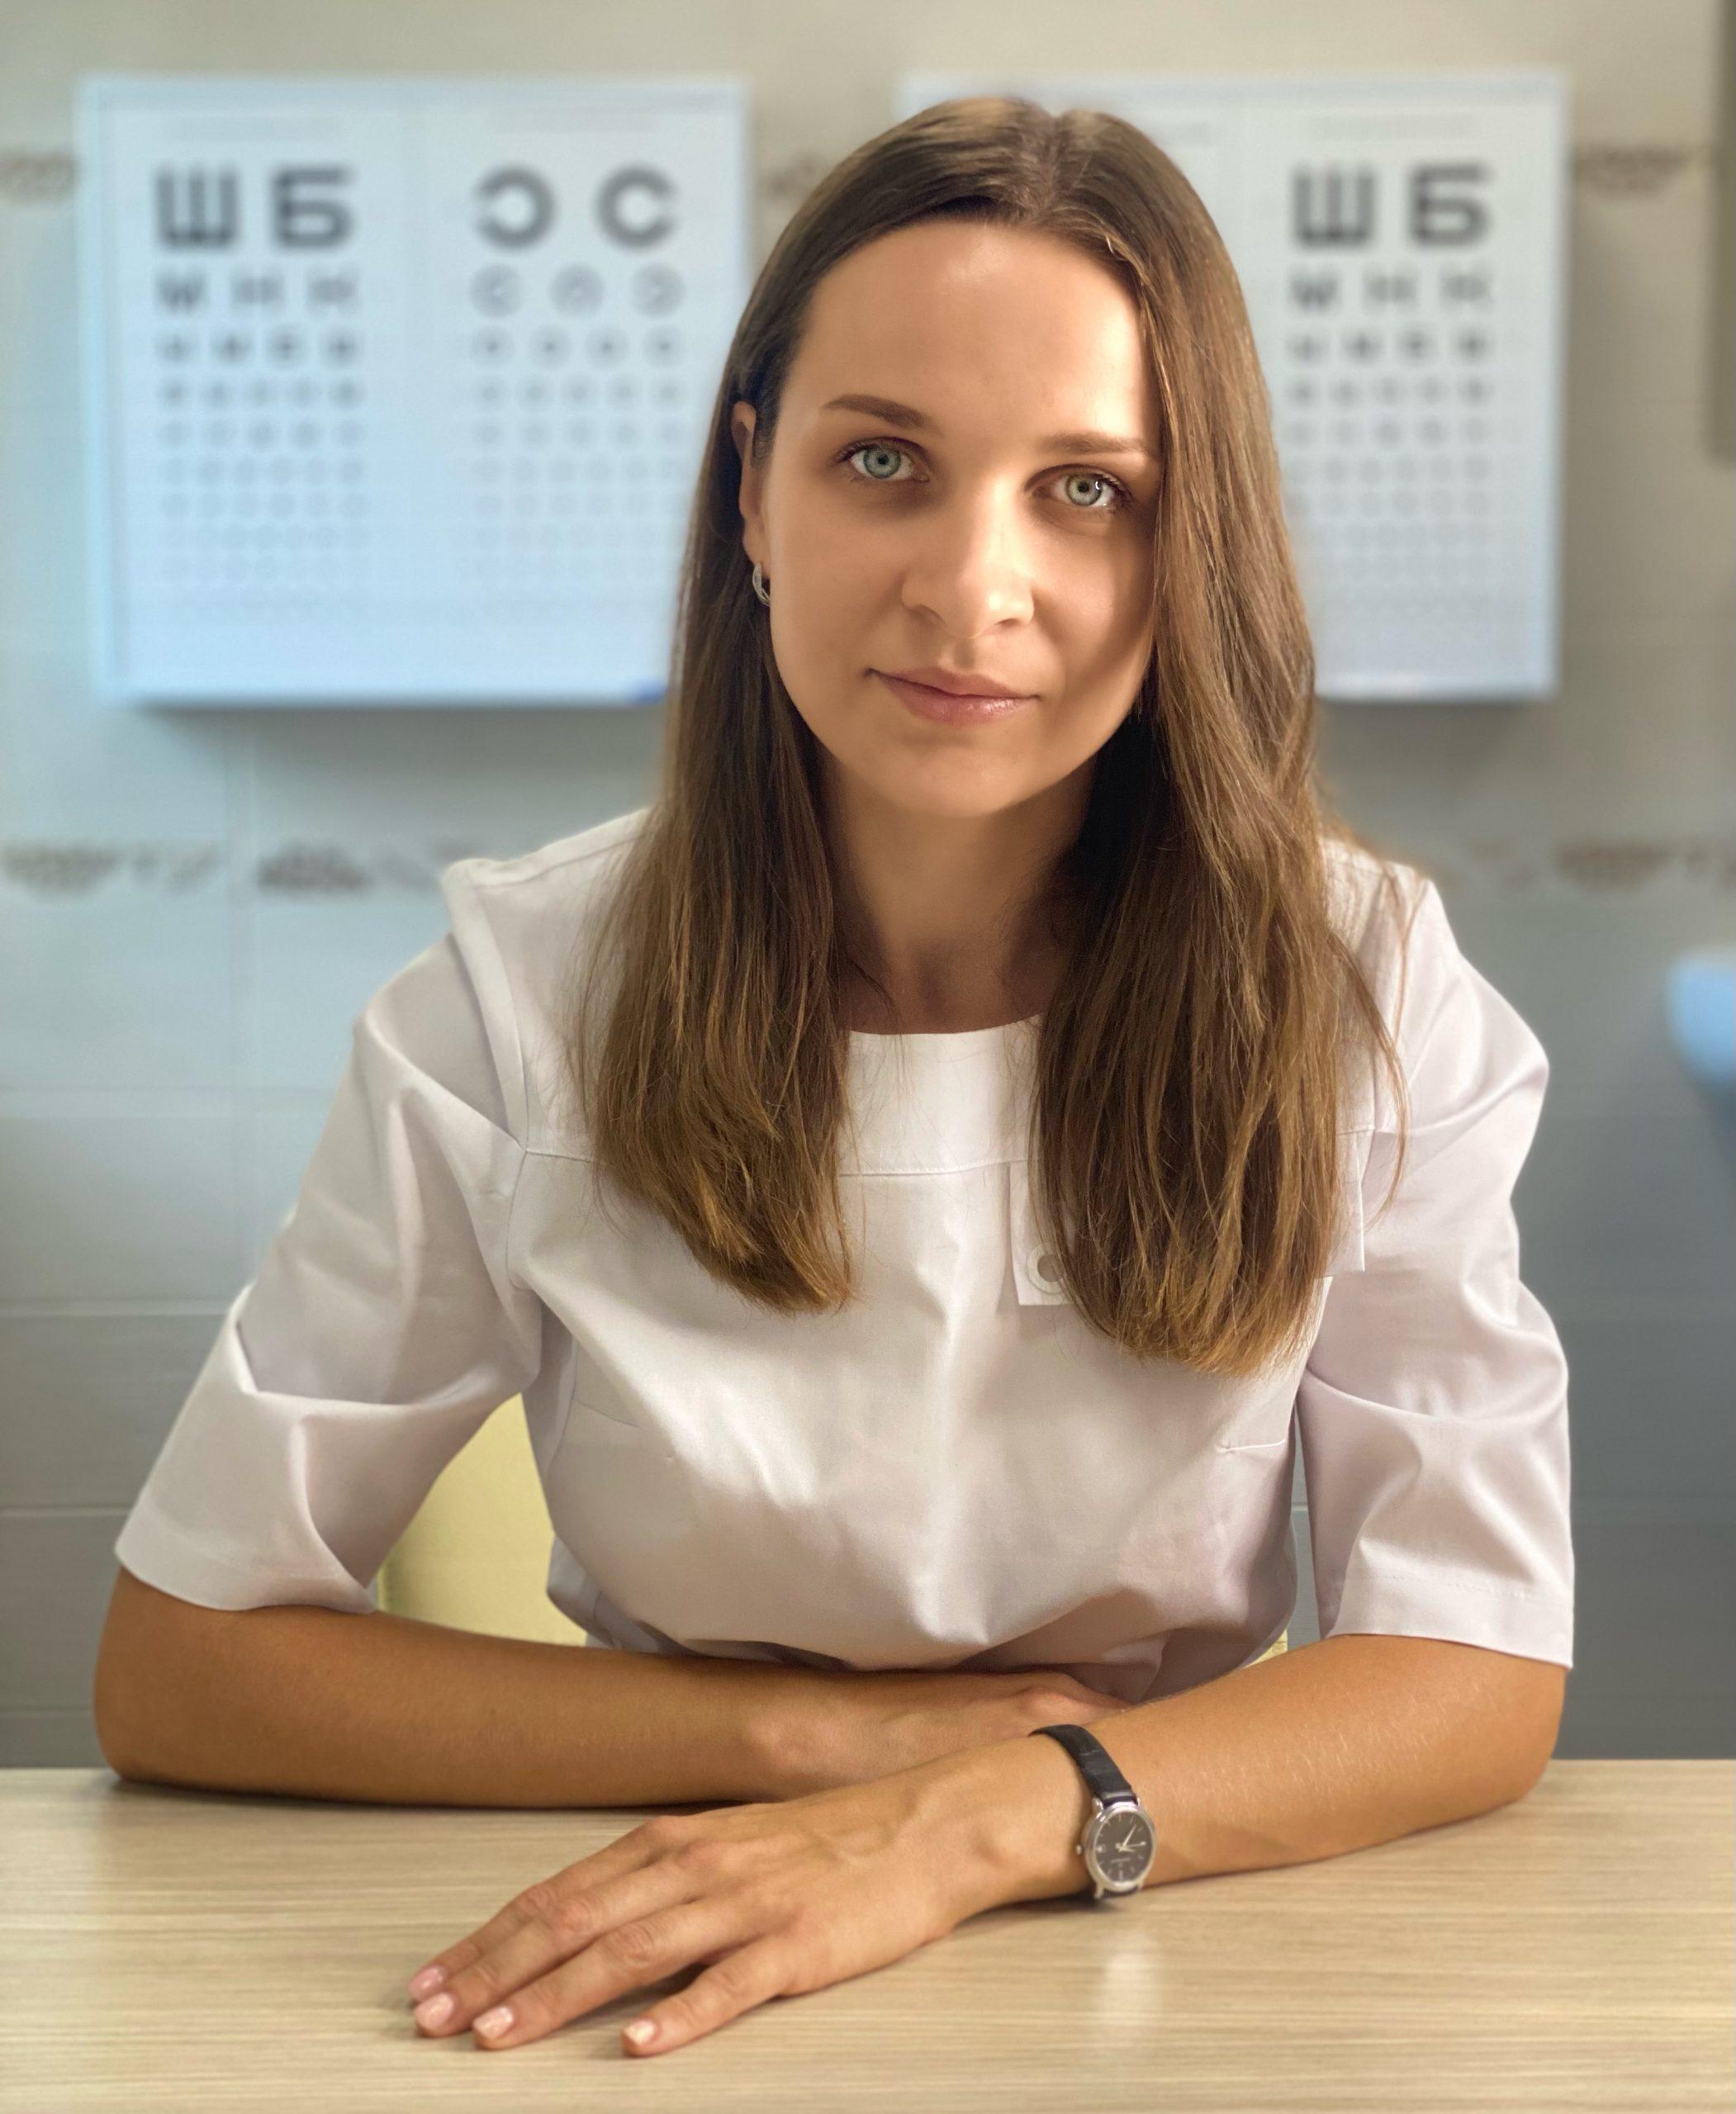 Светлана Борисовна Филитарина офтальмолог